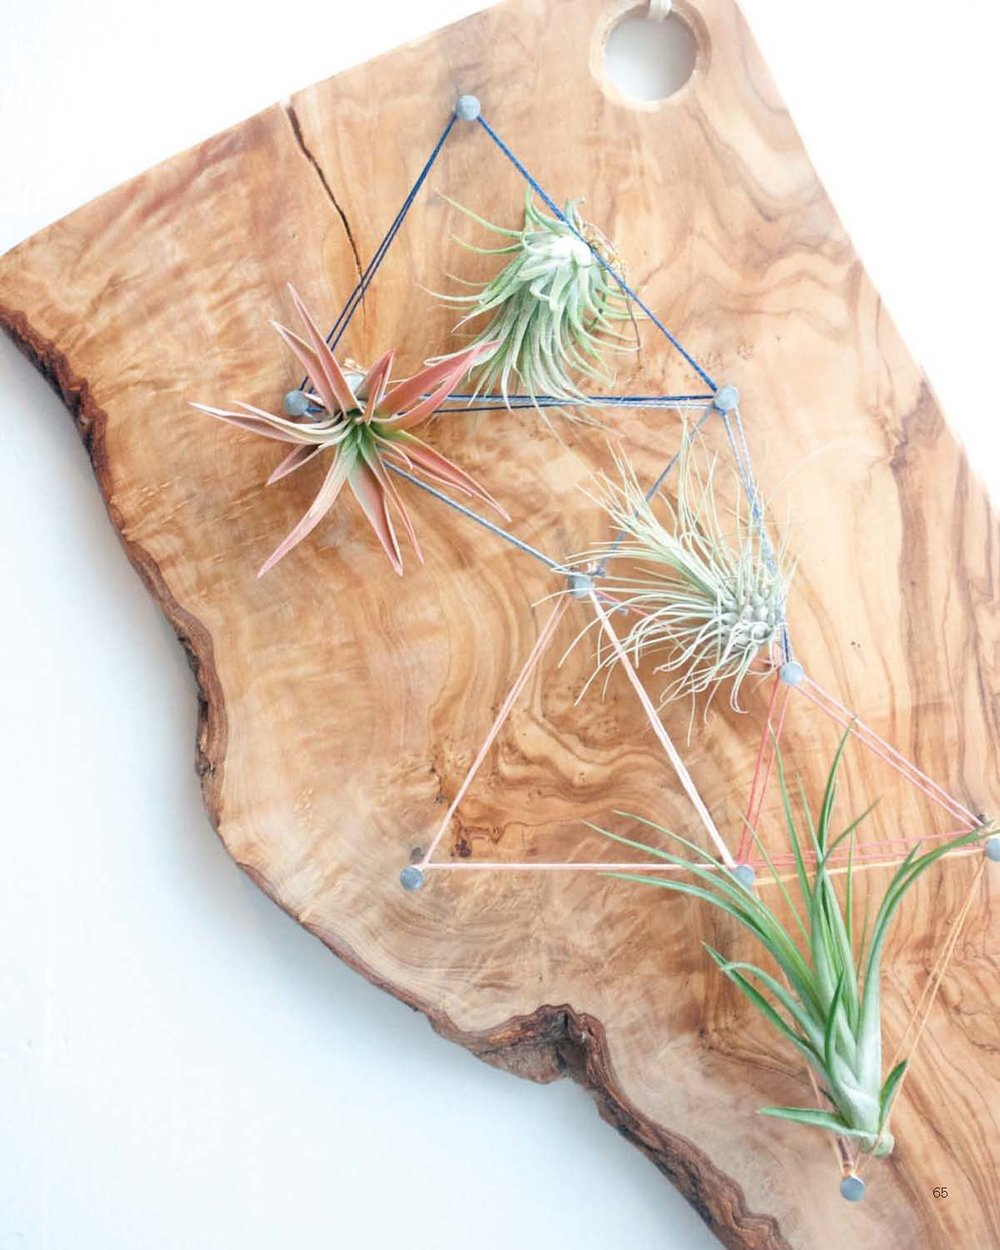 Modern Terrarium Studio - Wooden Geometry beauty image